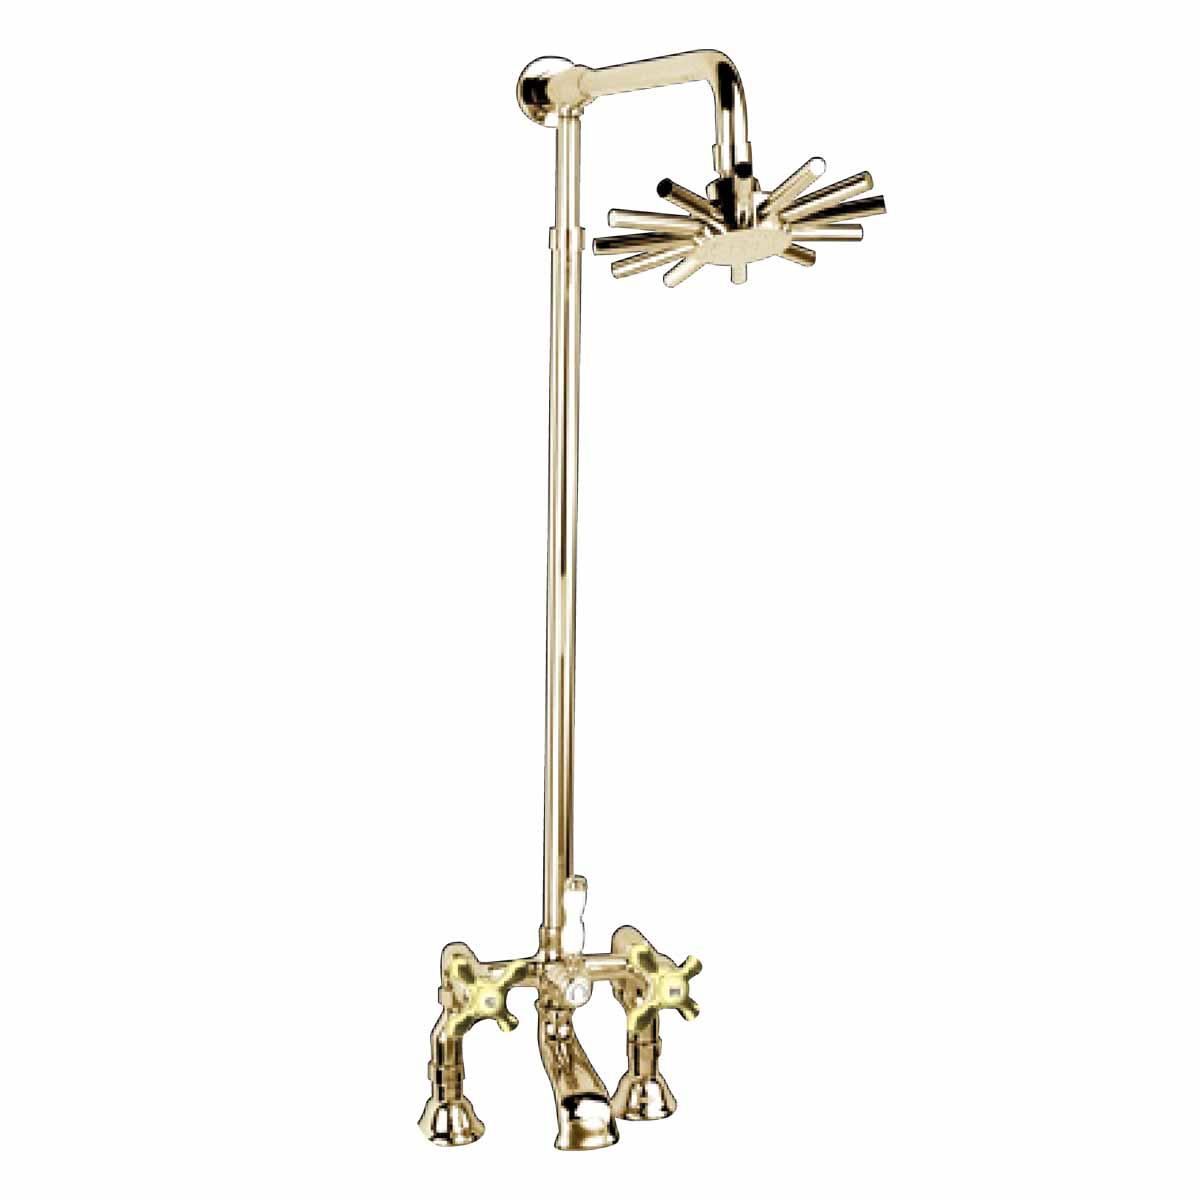 clawfoot tub faucet floor mount. Jiayoujia Floor Mounted Clawfoot Tub Filler Faucet  Deck Mount Amp Adjustable Shower Gold Pvd